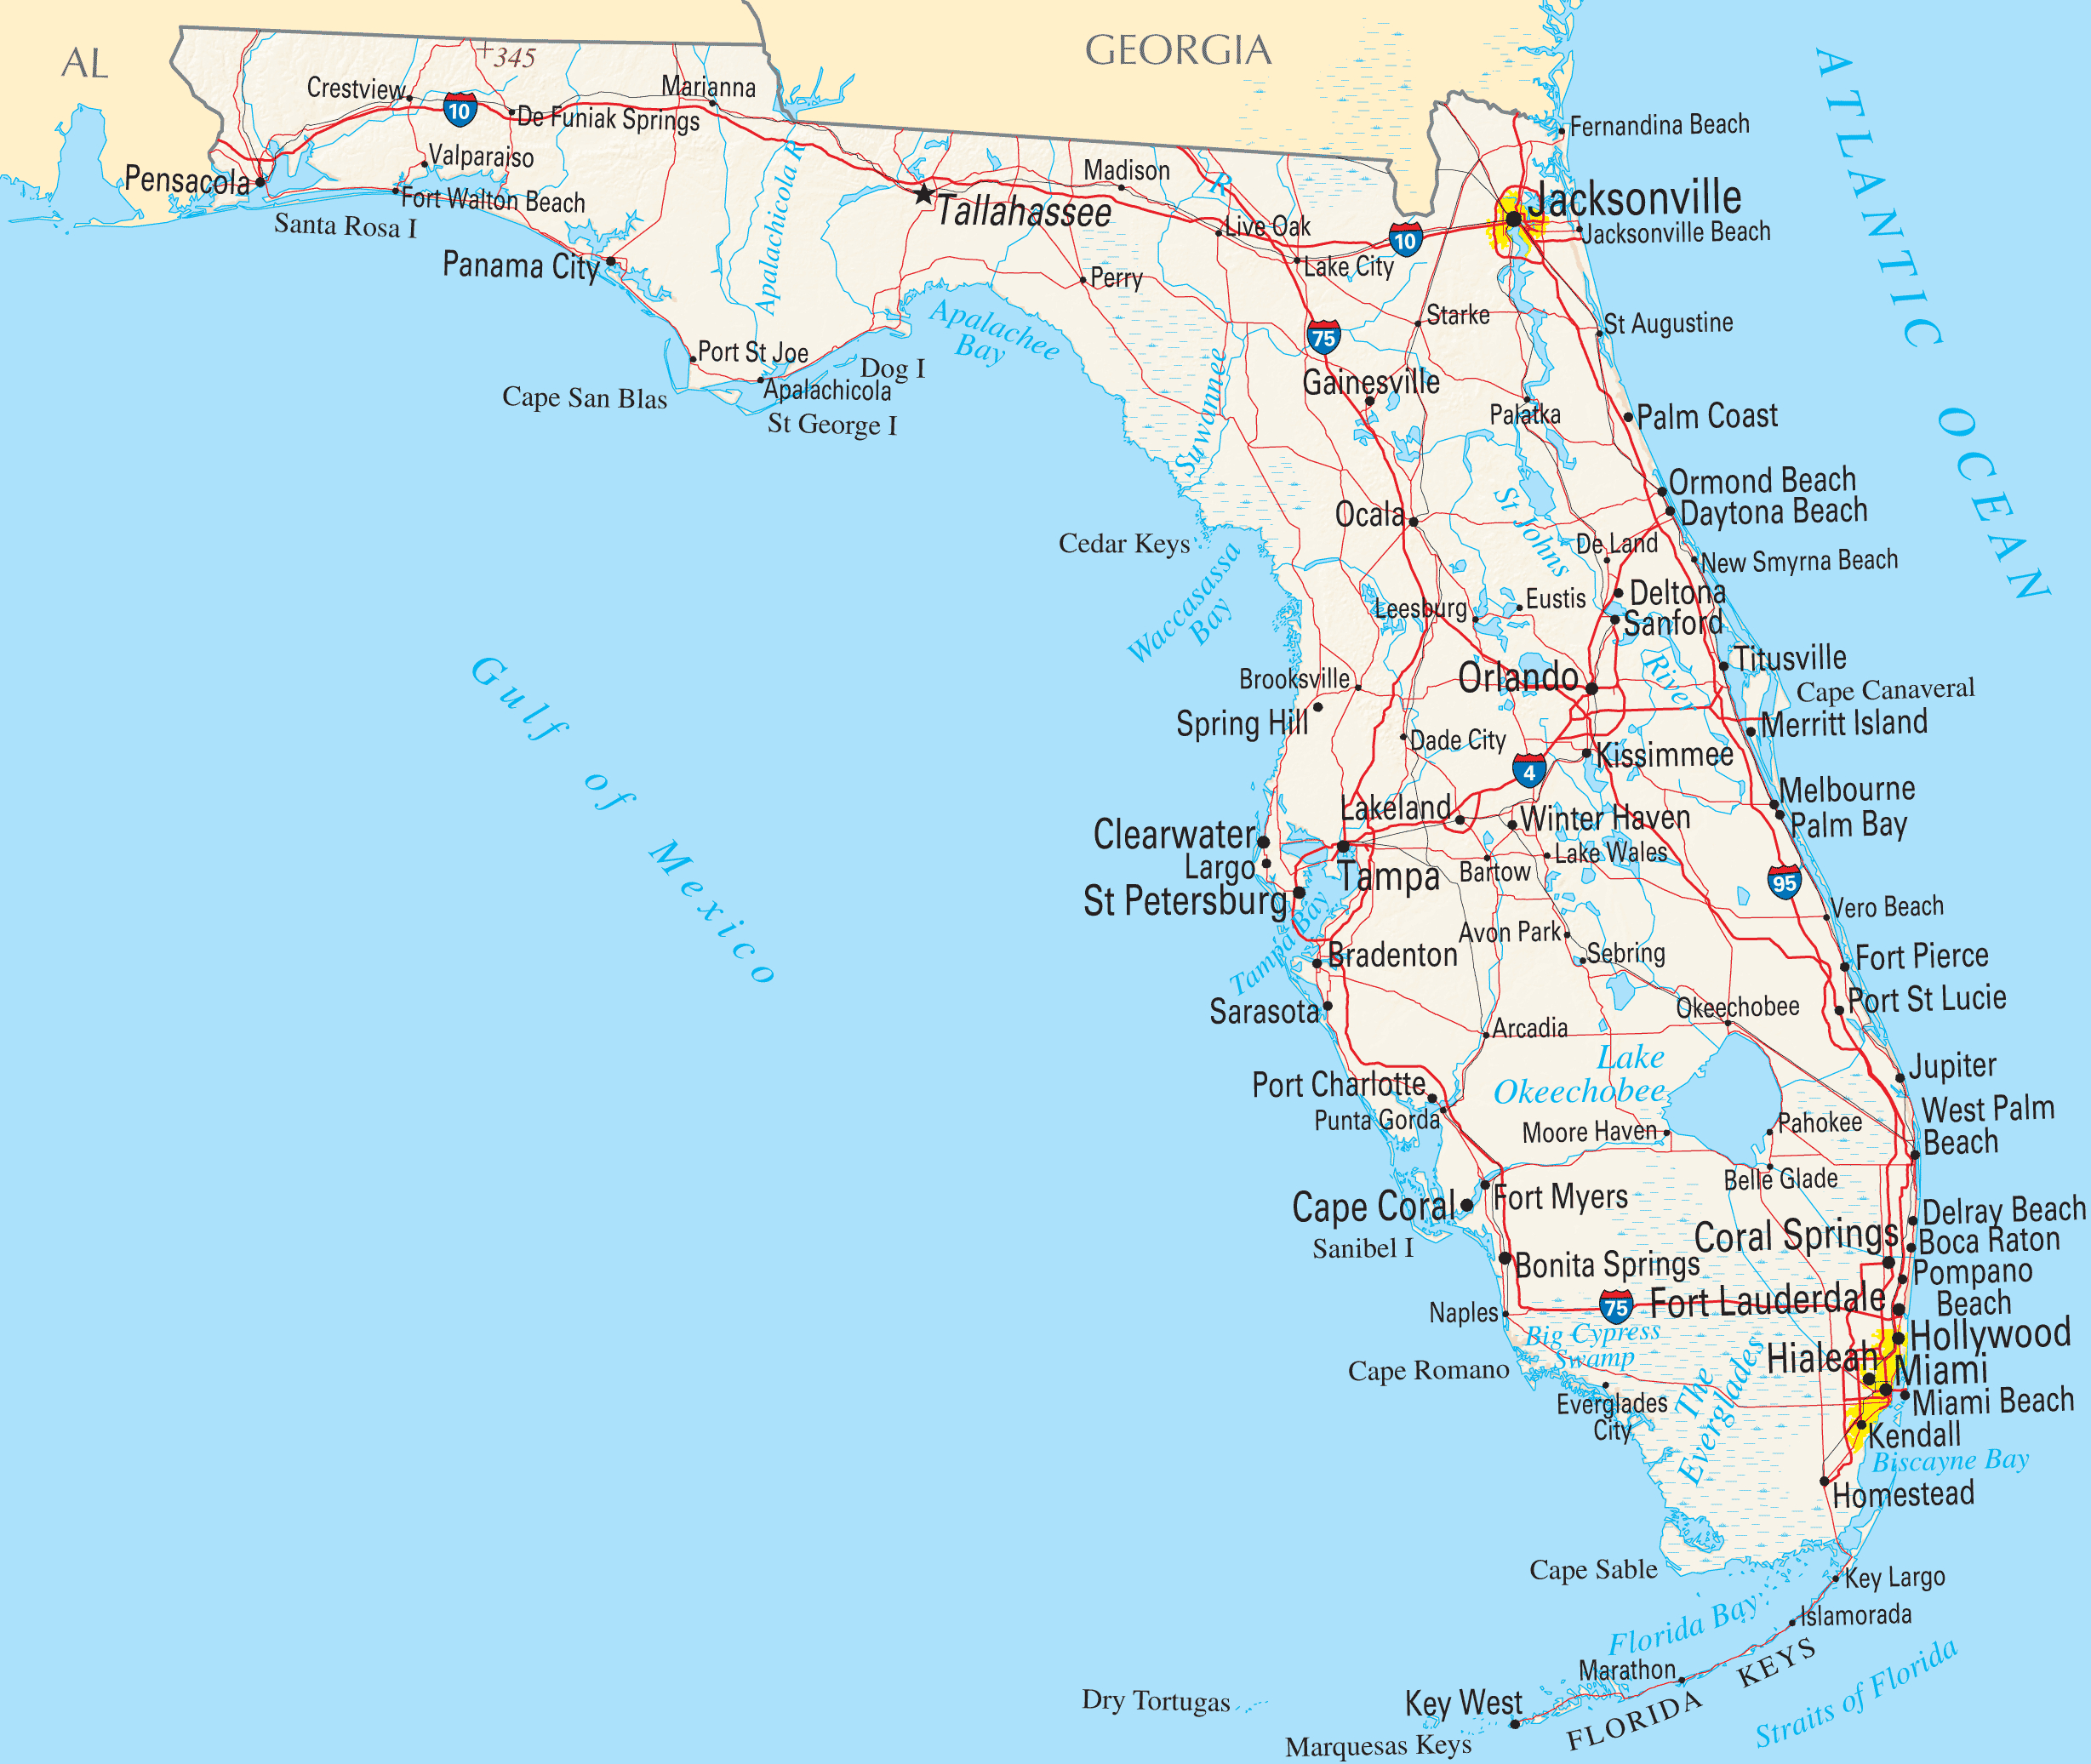 Florida Reference Map • Mapsof - Florida Street Map